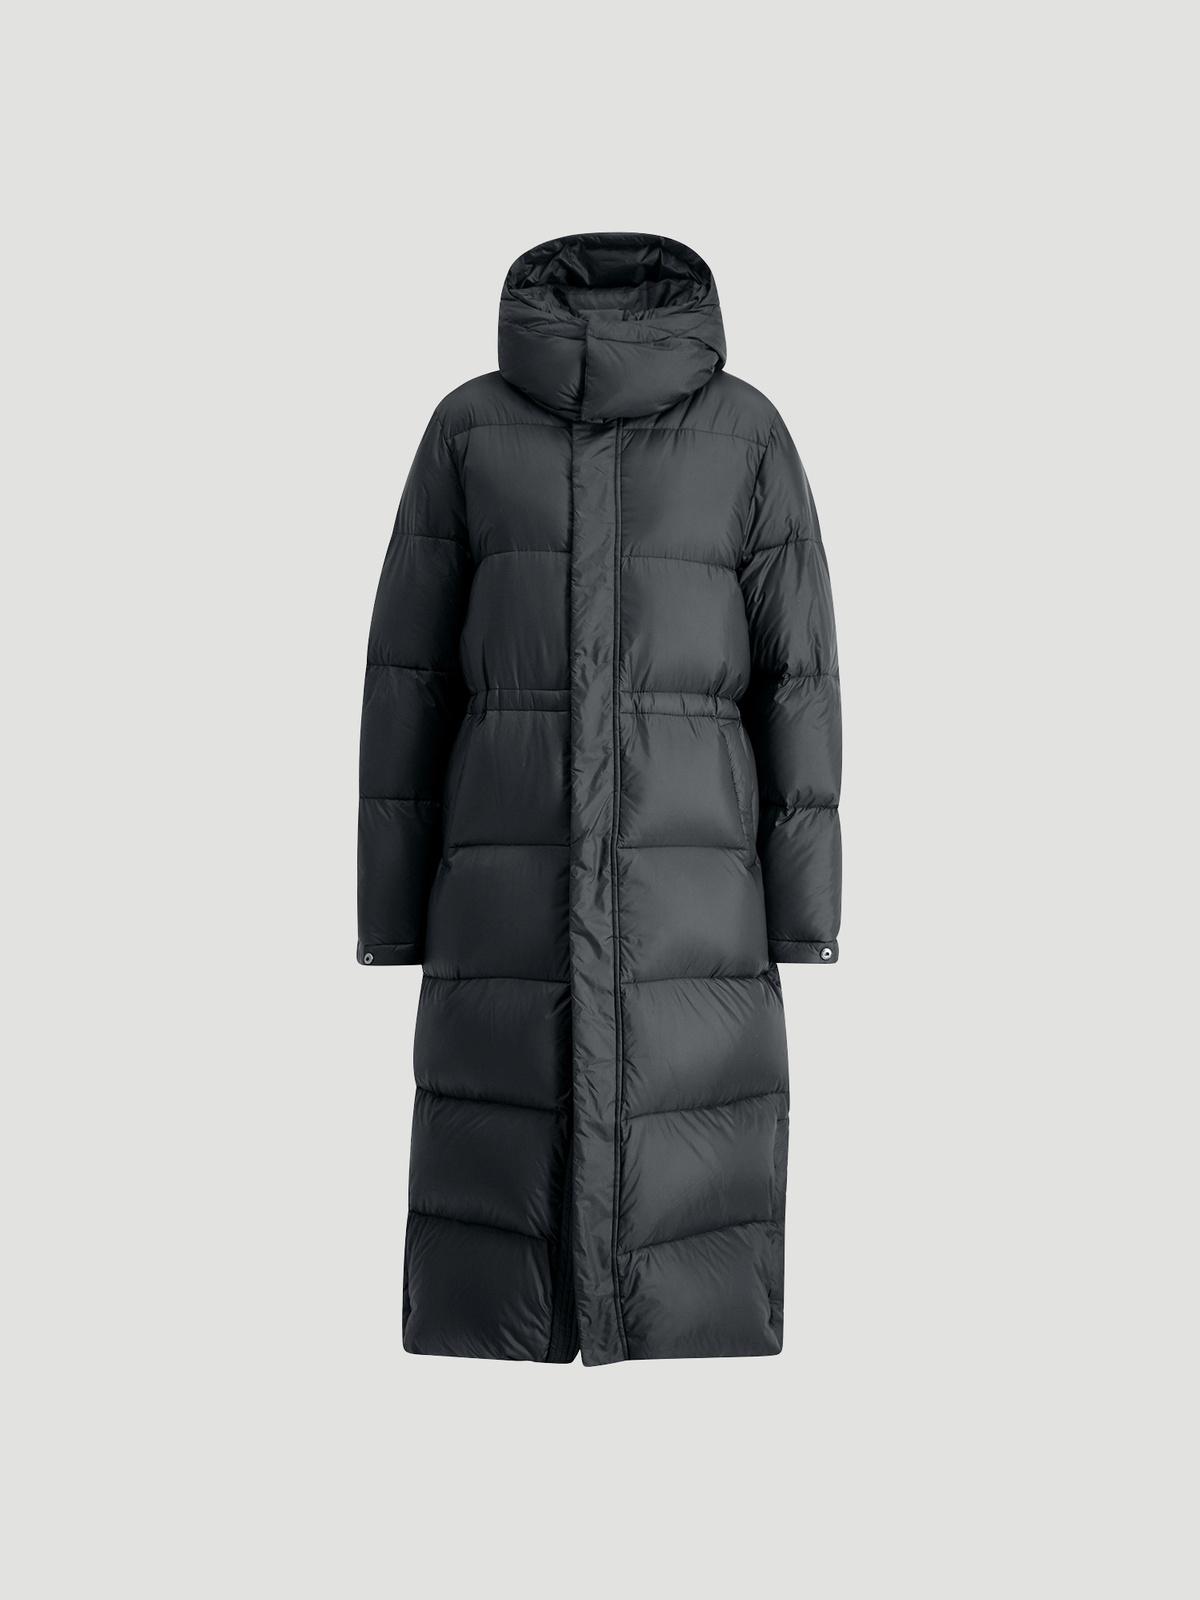 Skogshorn Down Jacket  Black 4